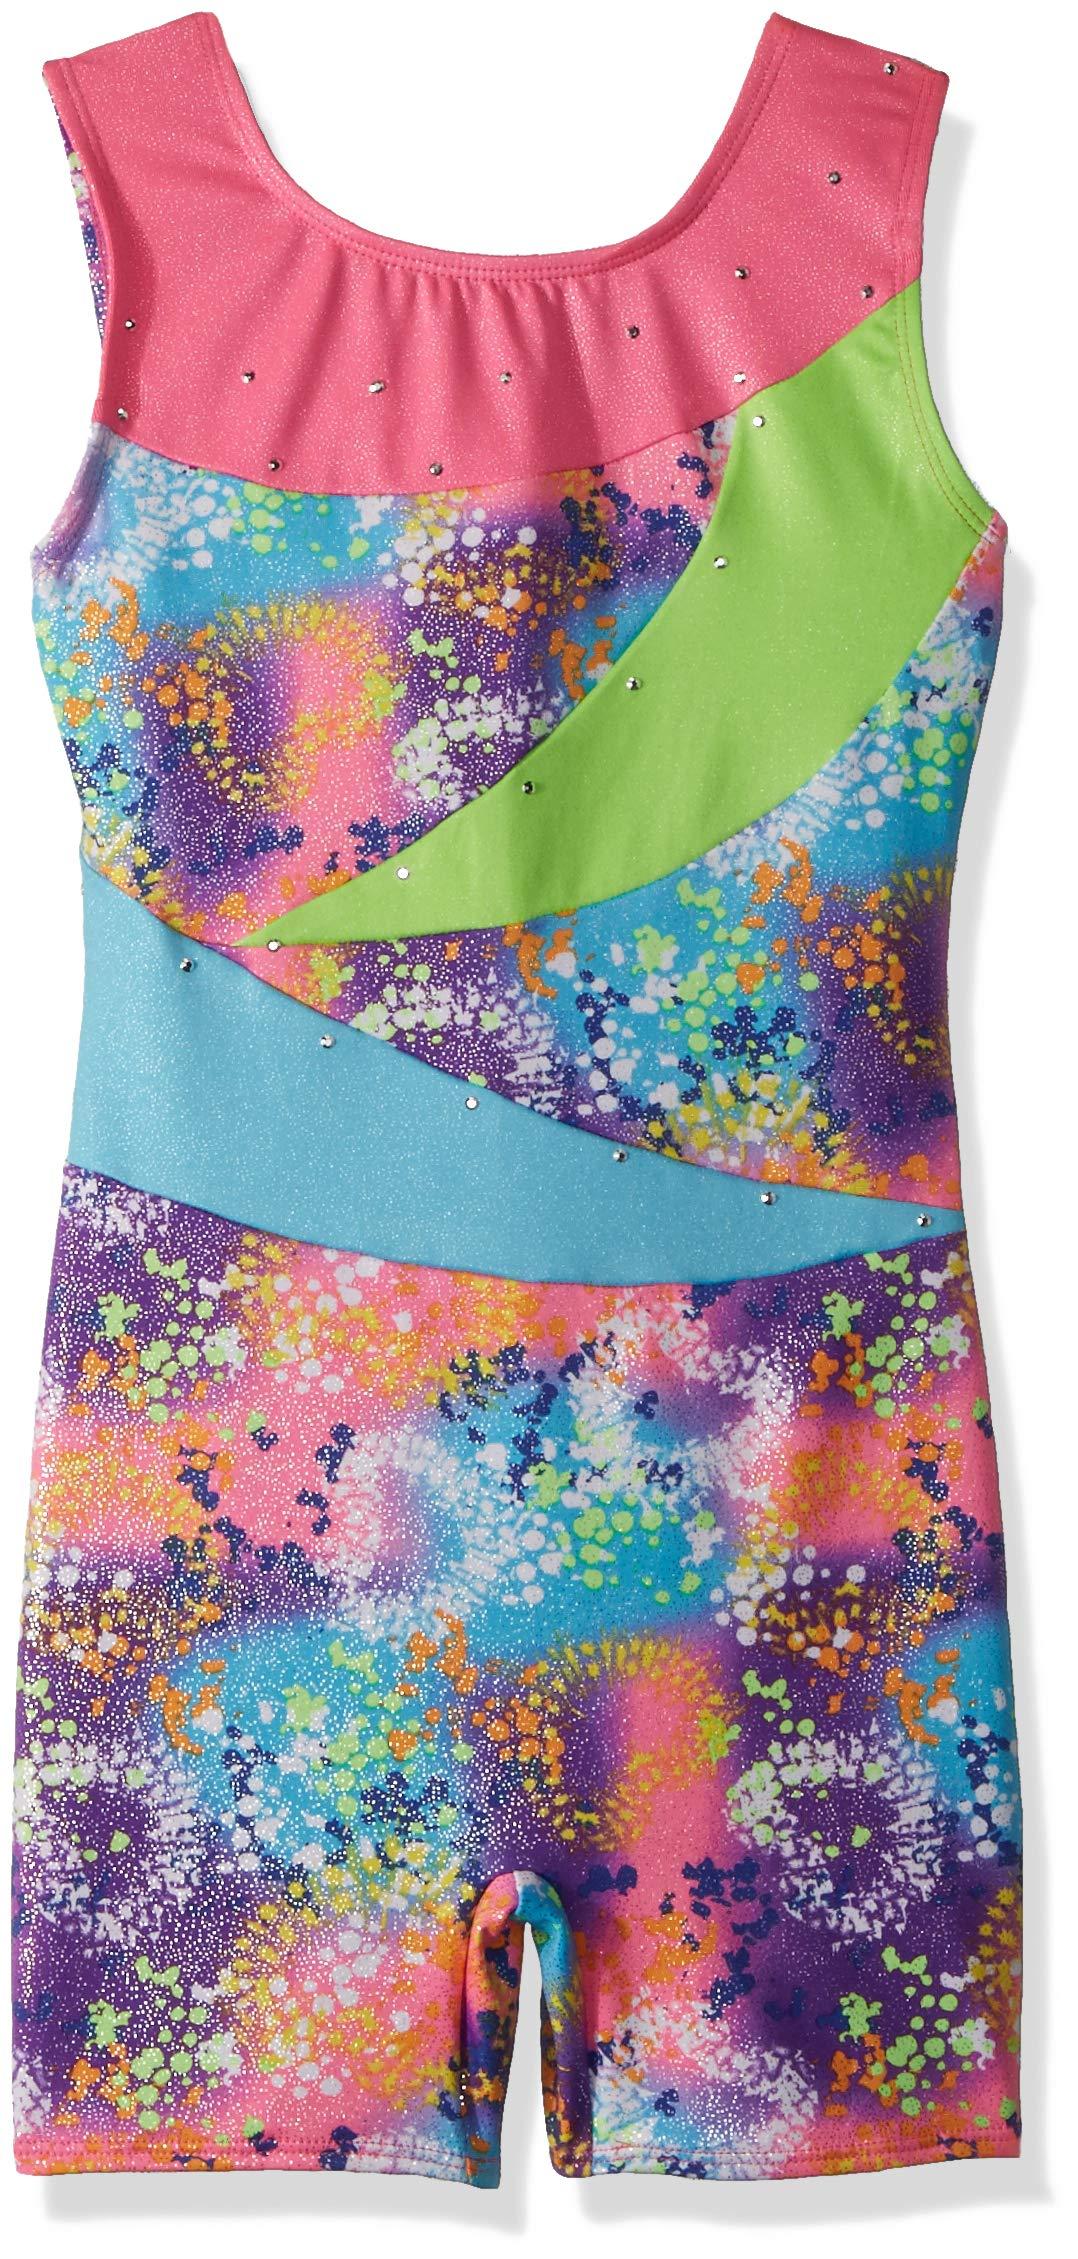 Jacques Moret Little Girls' Fun Gymnastics Biketard, Tie Dye Hearts Printed Color Block, S